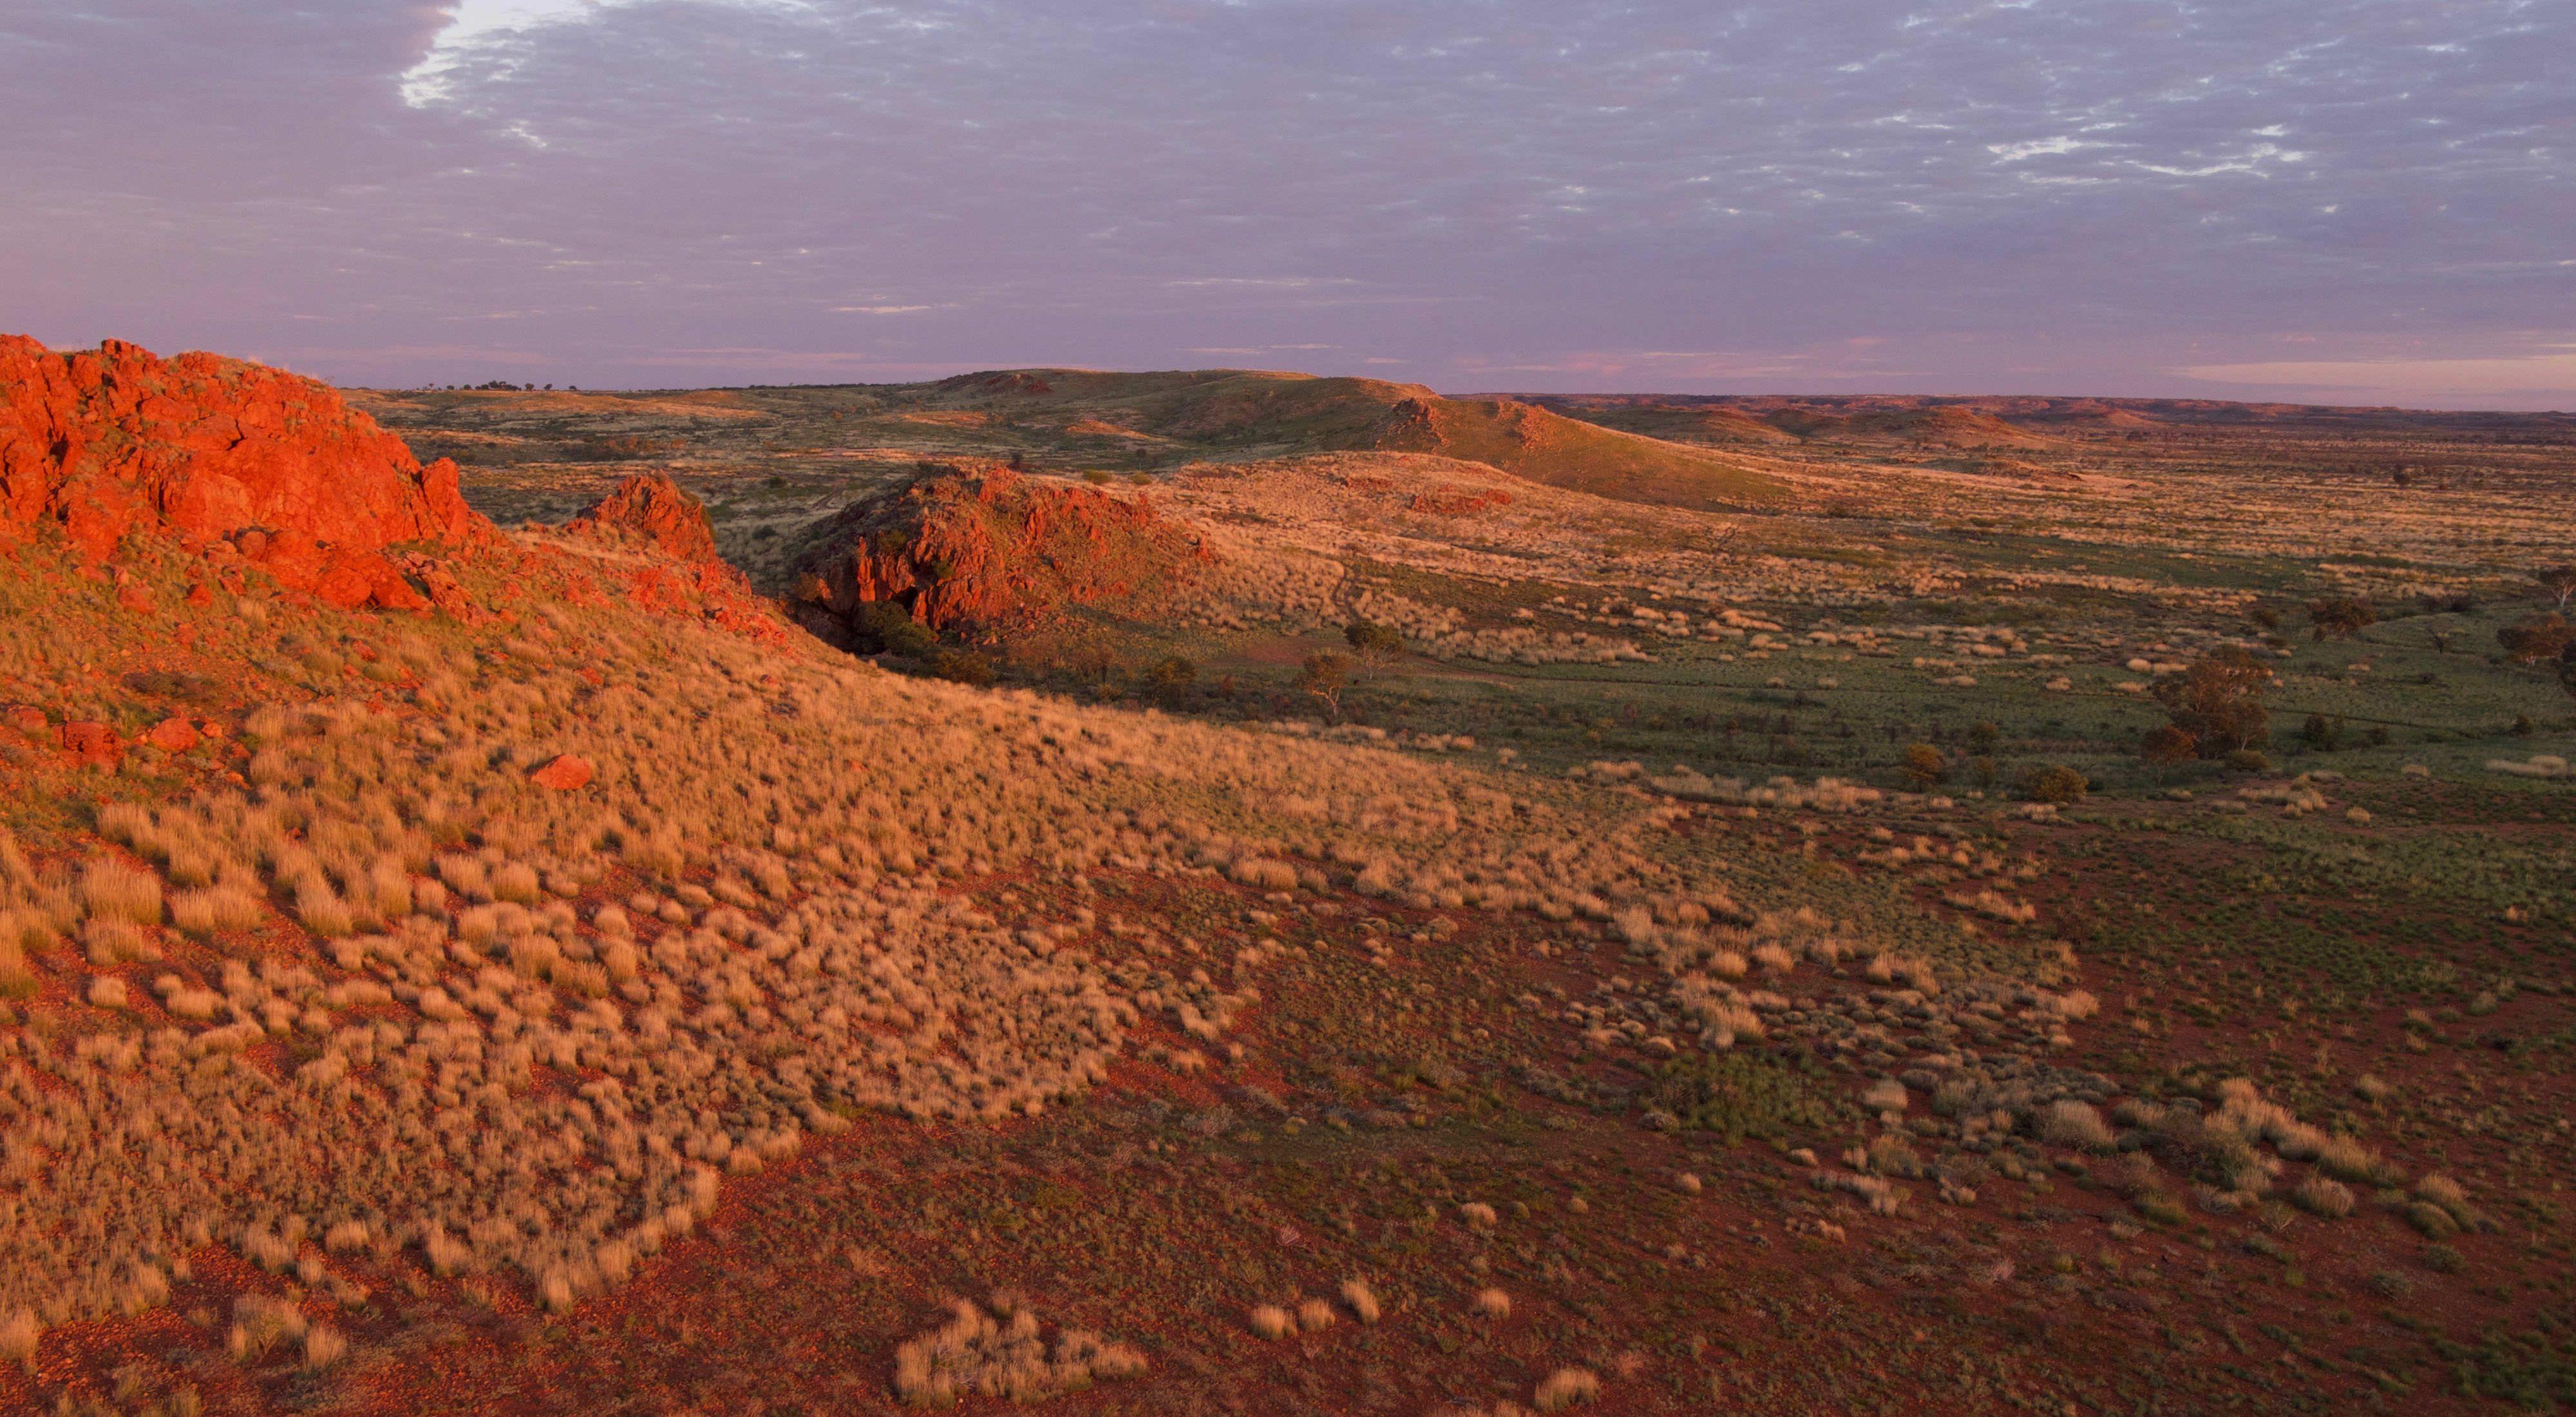 in Western Desert, Western Australia